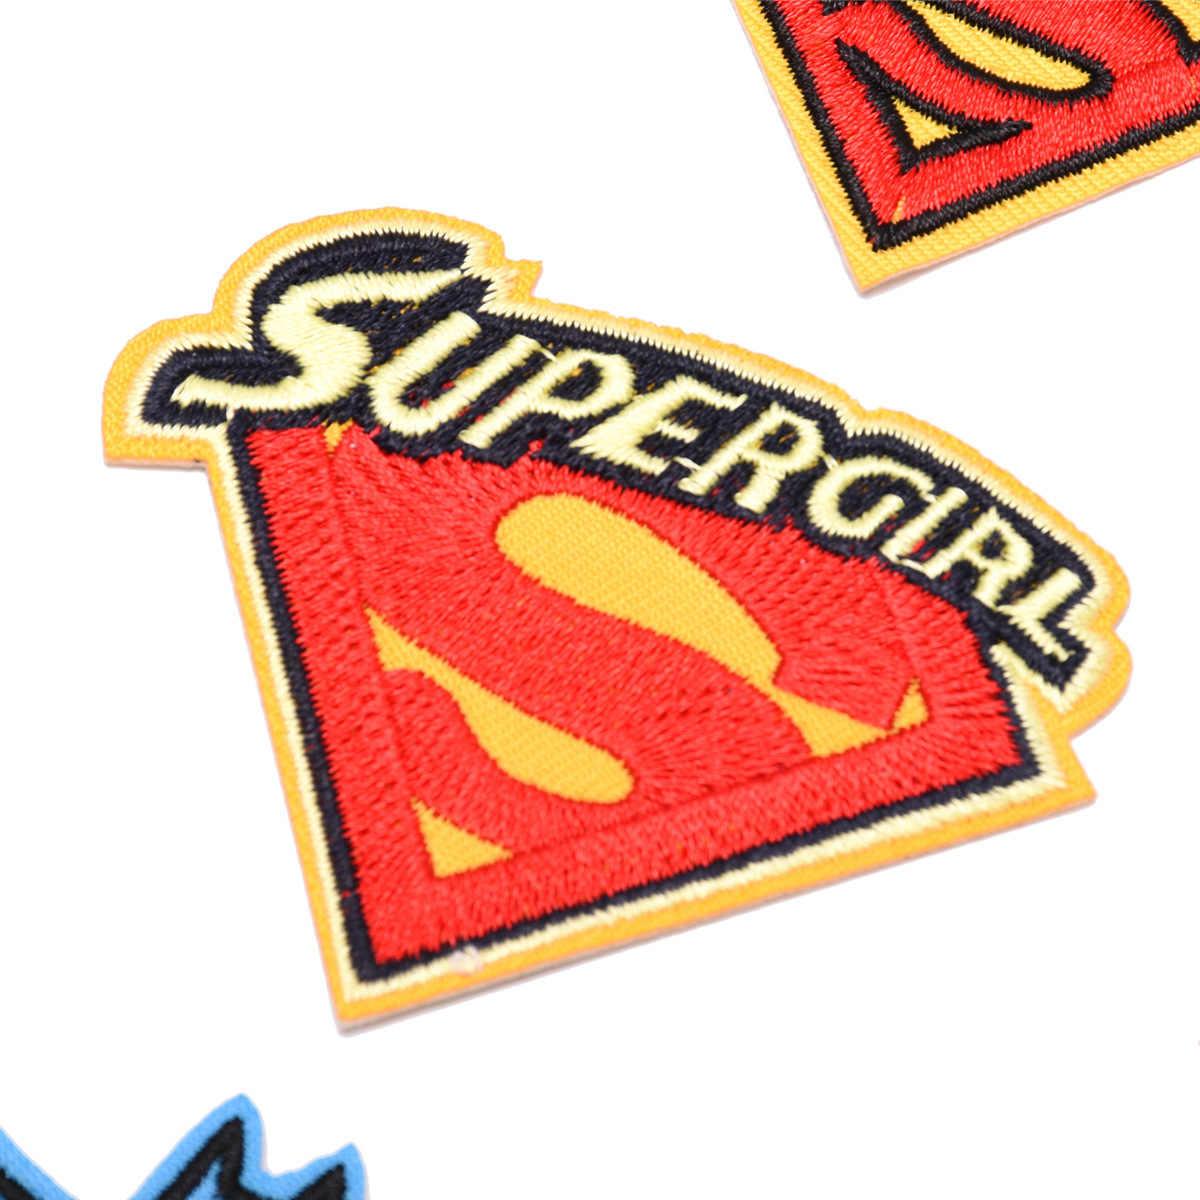 1 Pcs איש ברזל ספיידרמן באטמן סופרמן דברים ברזל על תיקוני בגדי רקמת בגדים חמוד DIY נצנצים Applique תג